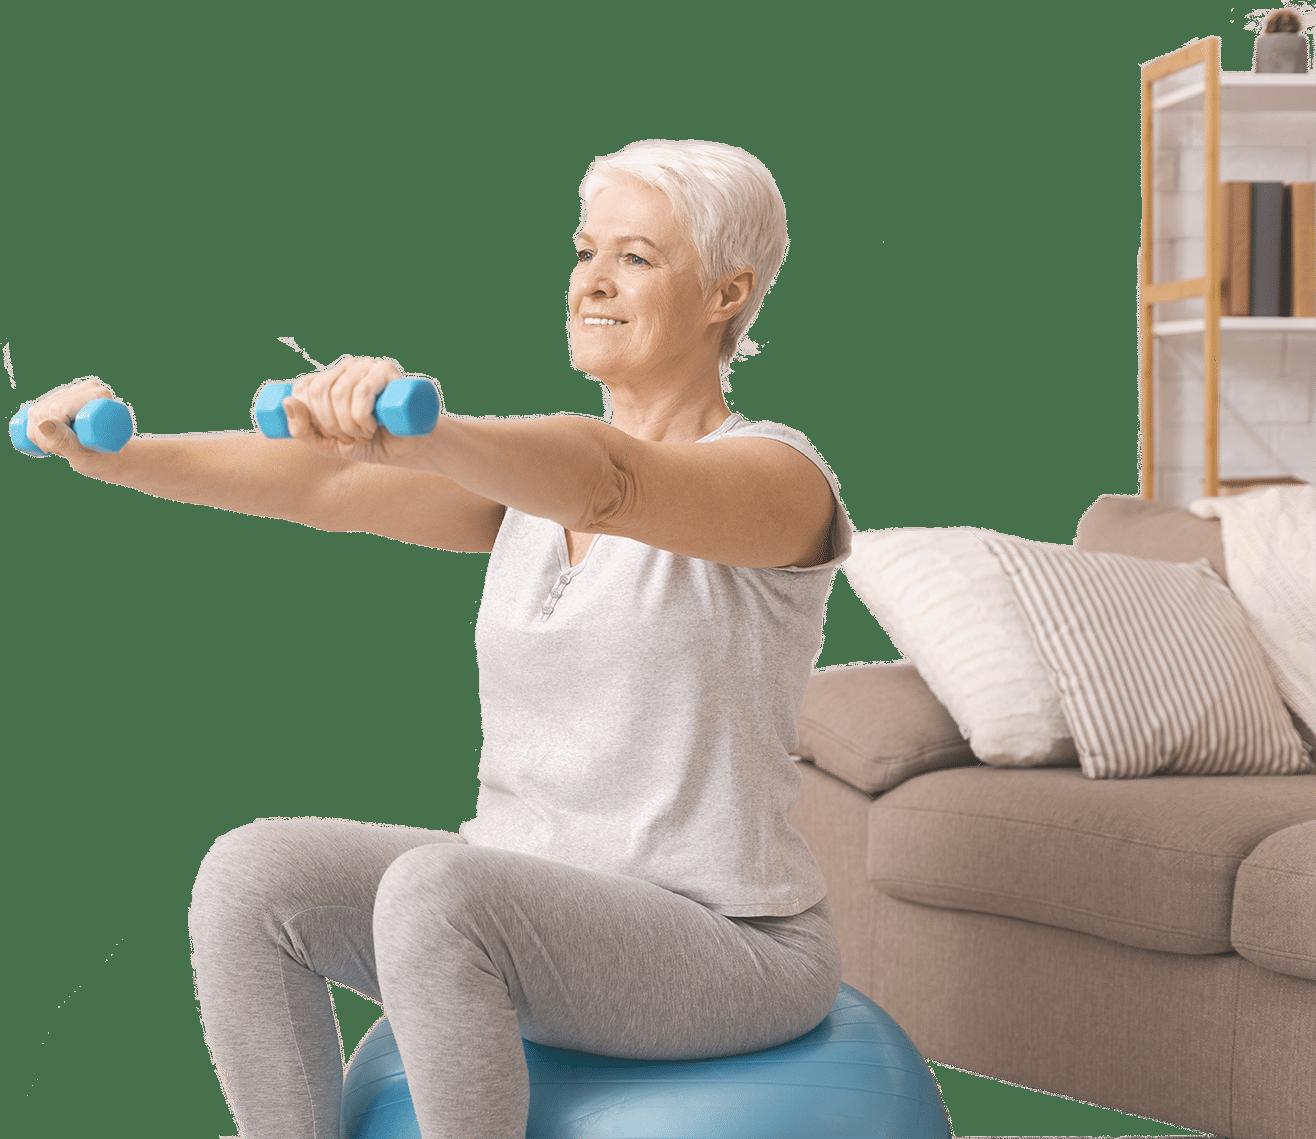 Eldre dame sitter på gymball og trener hjemme i stue